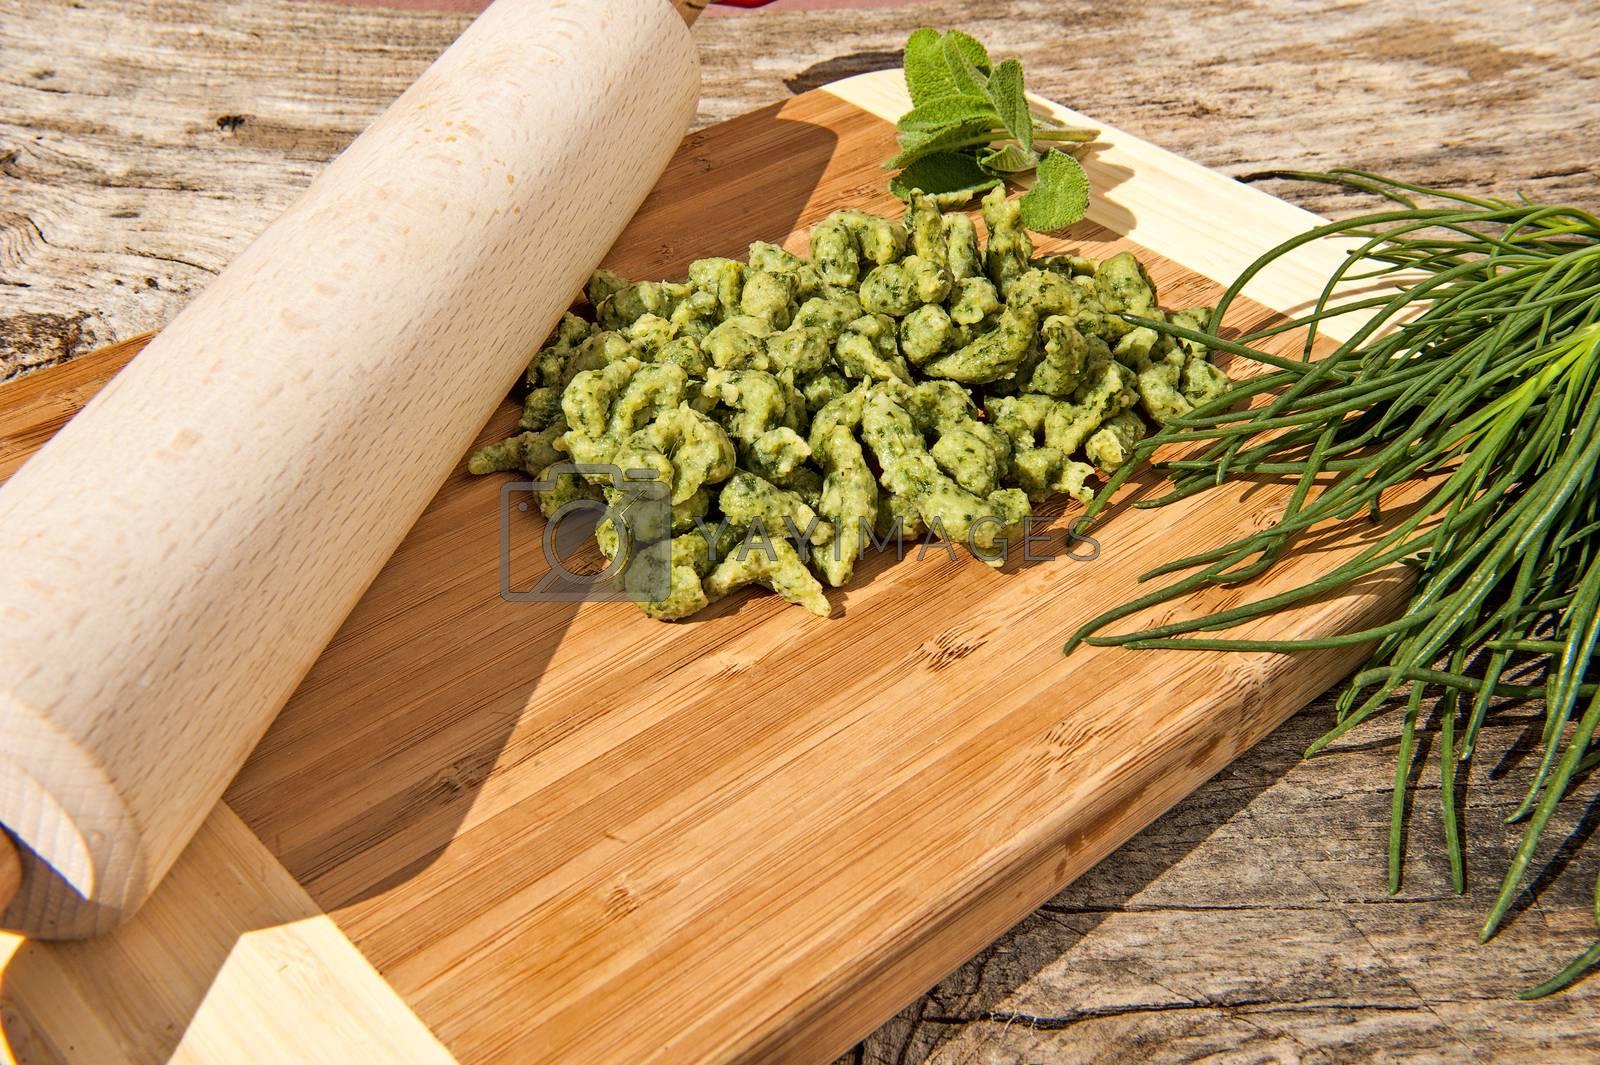 some dumplings fresh vegetables and aromatic herbs